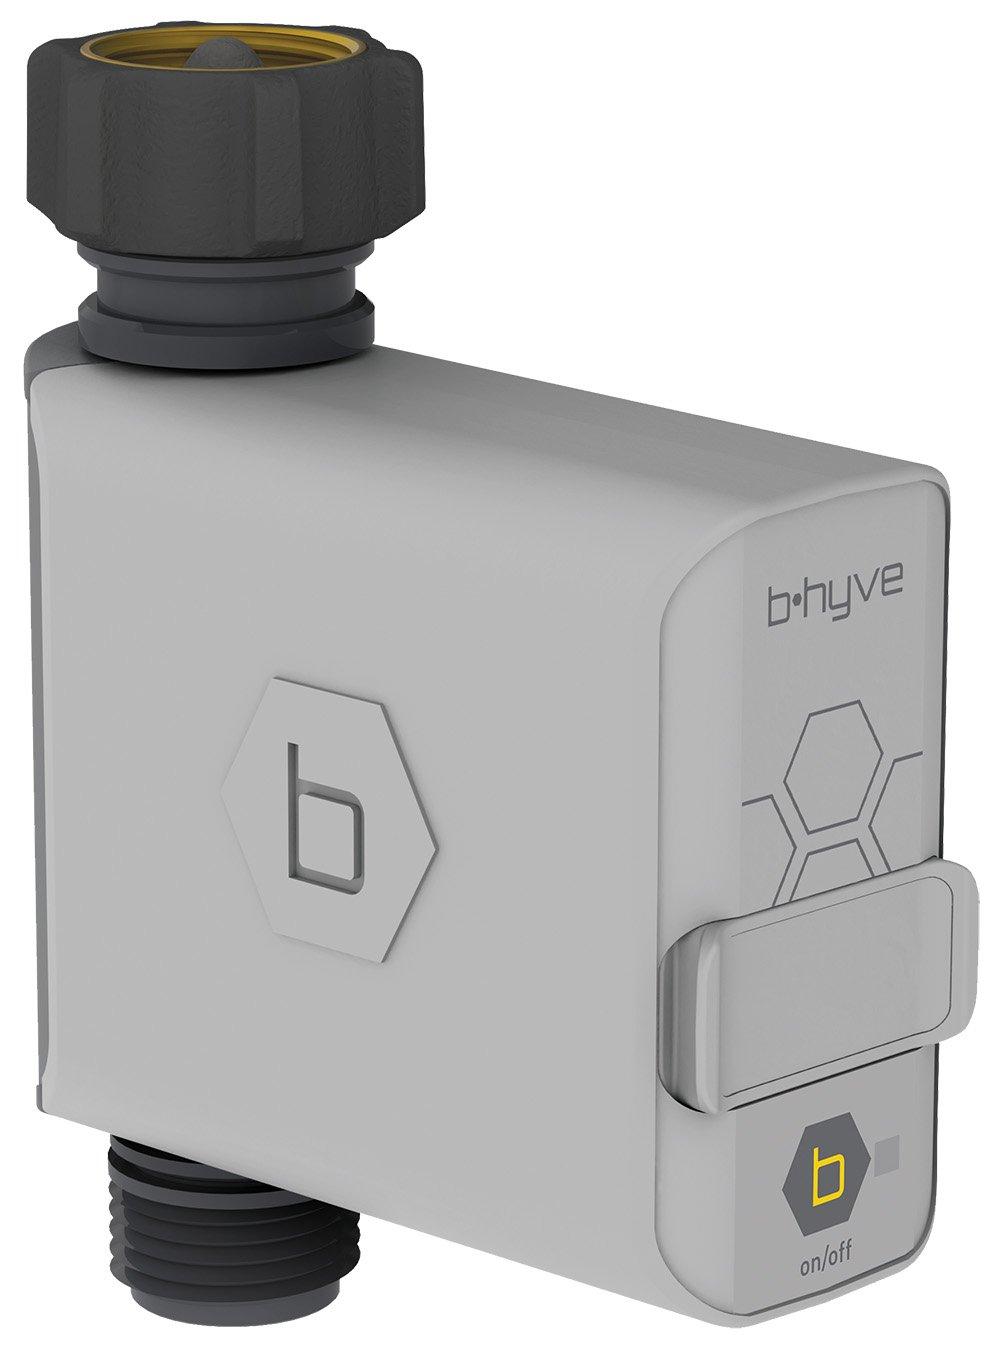 Orbit B hyve 21005 Bluetooth Faucet